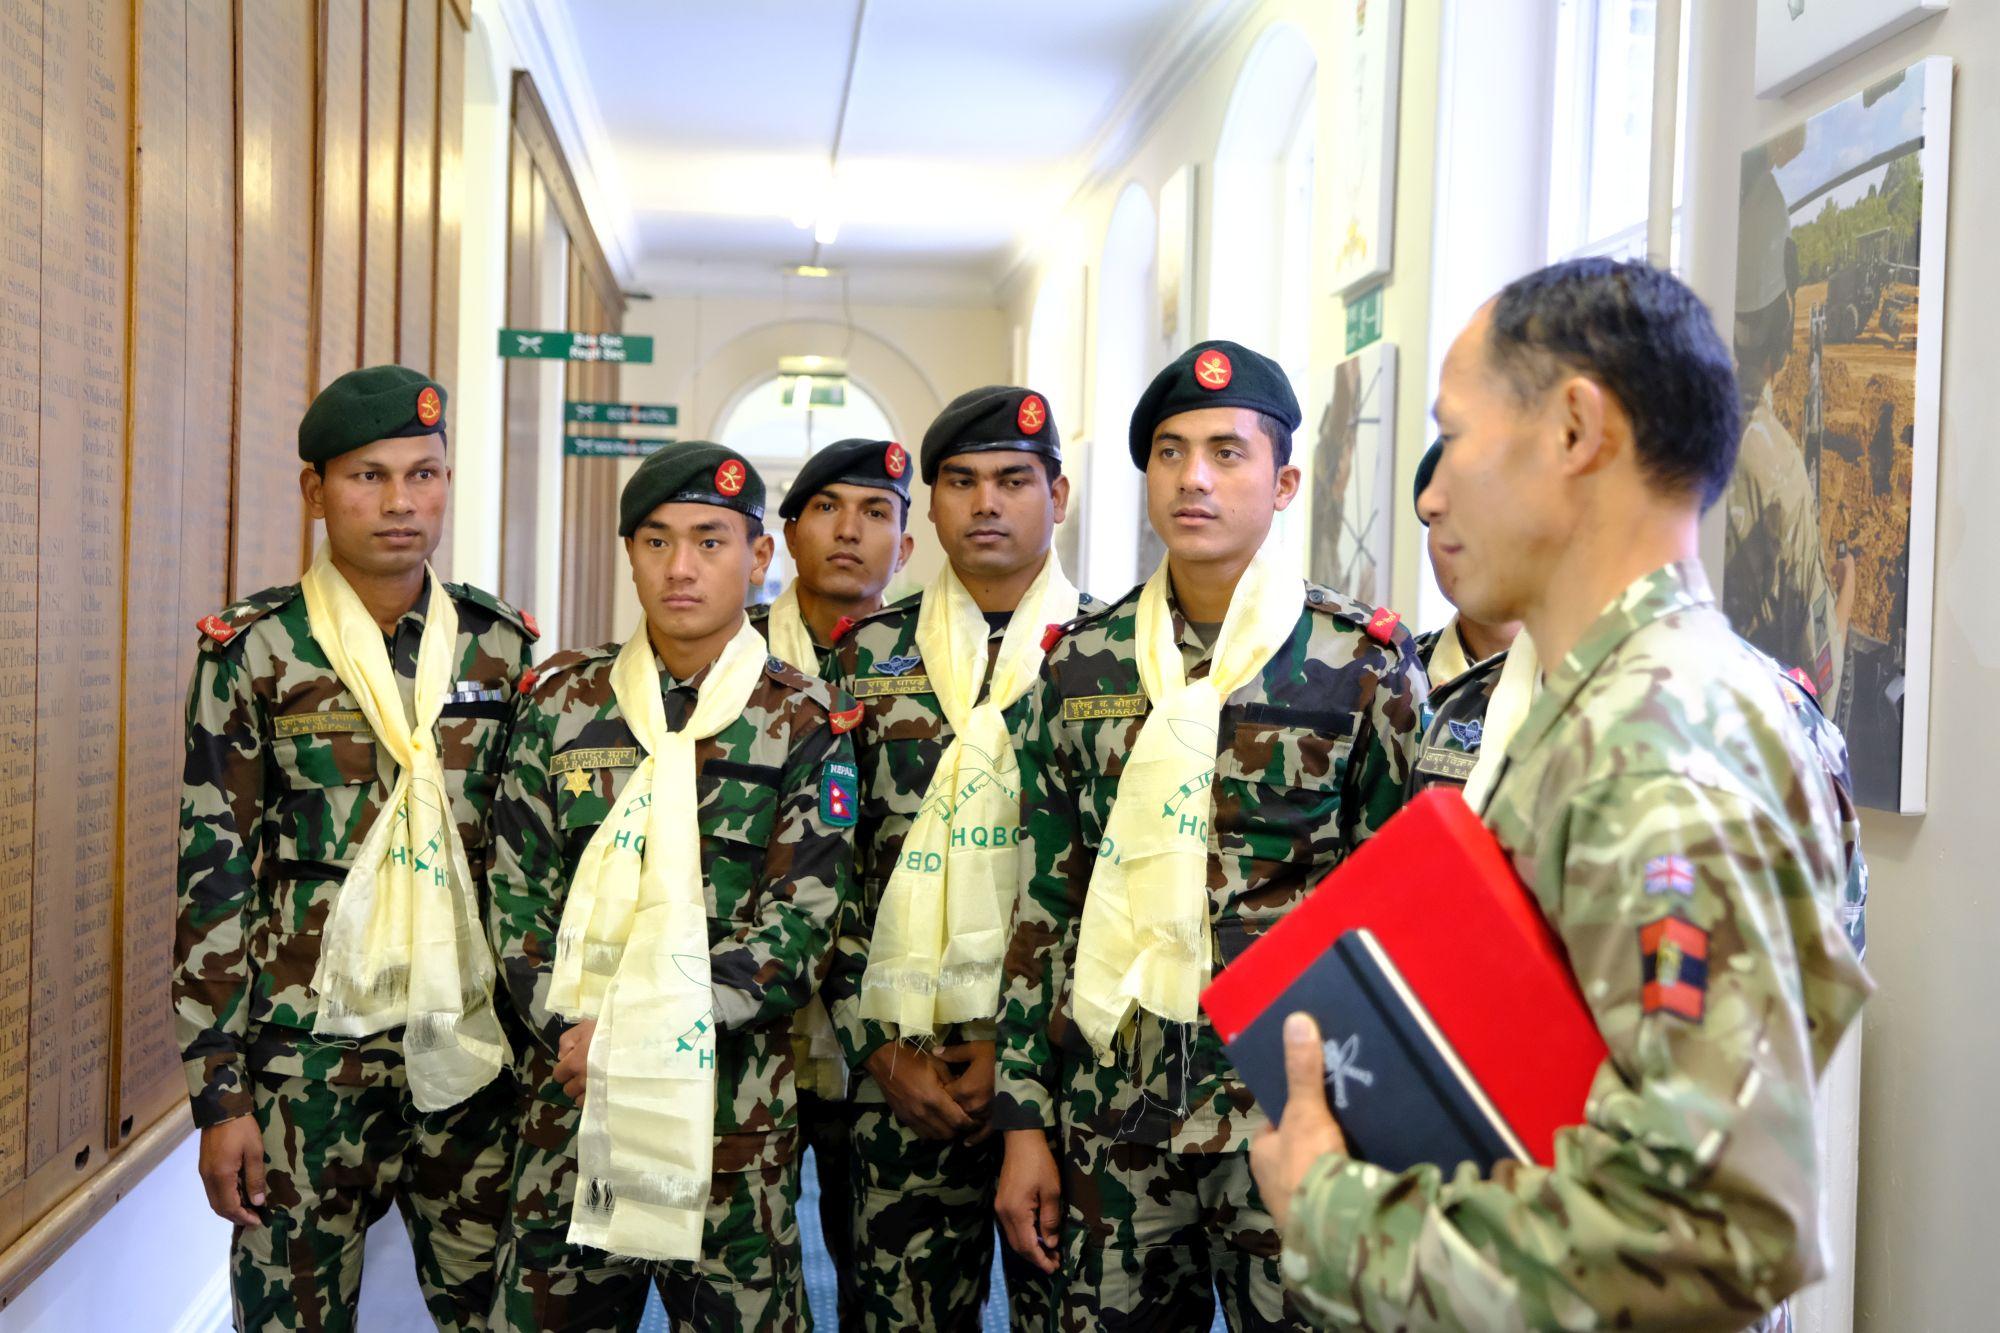 Nepal Army Cambrian Patrol Team Visit HQBG 007